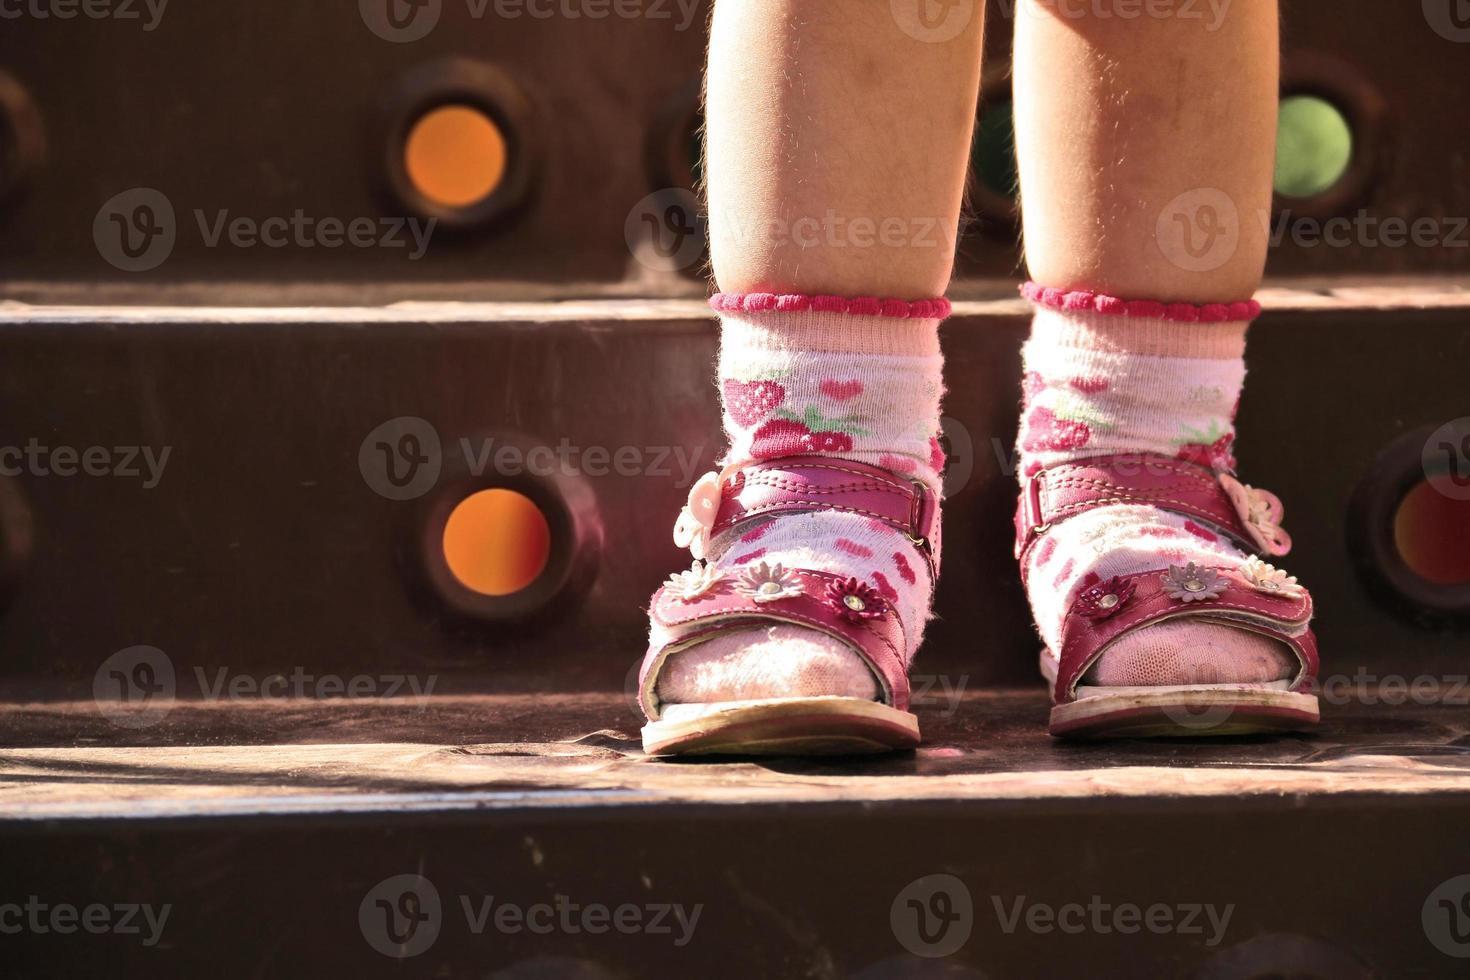 baby benen in schoenen en sokken, staande op trappen foto